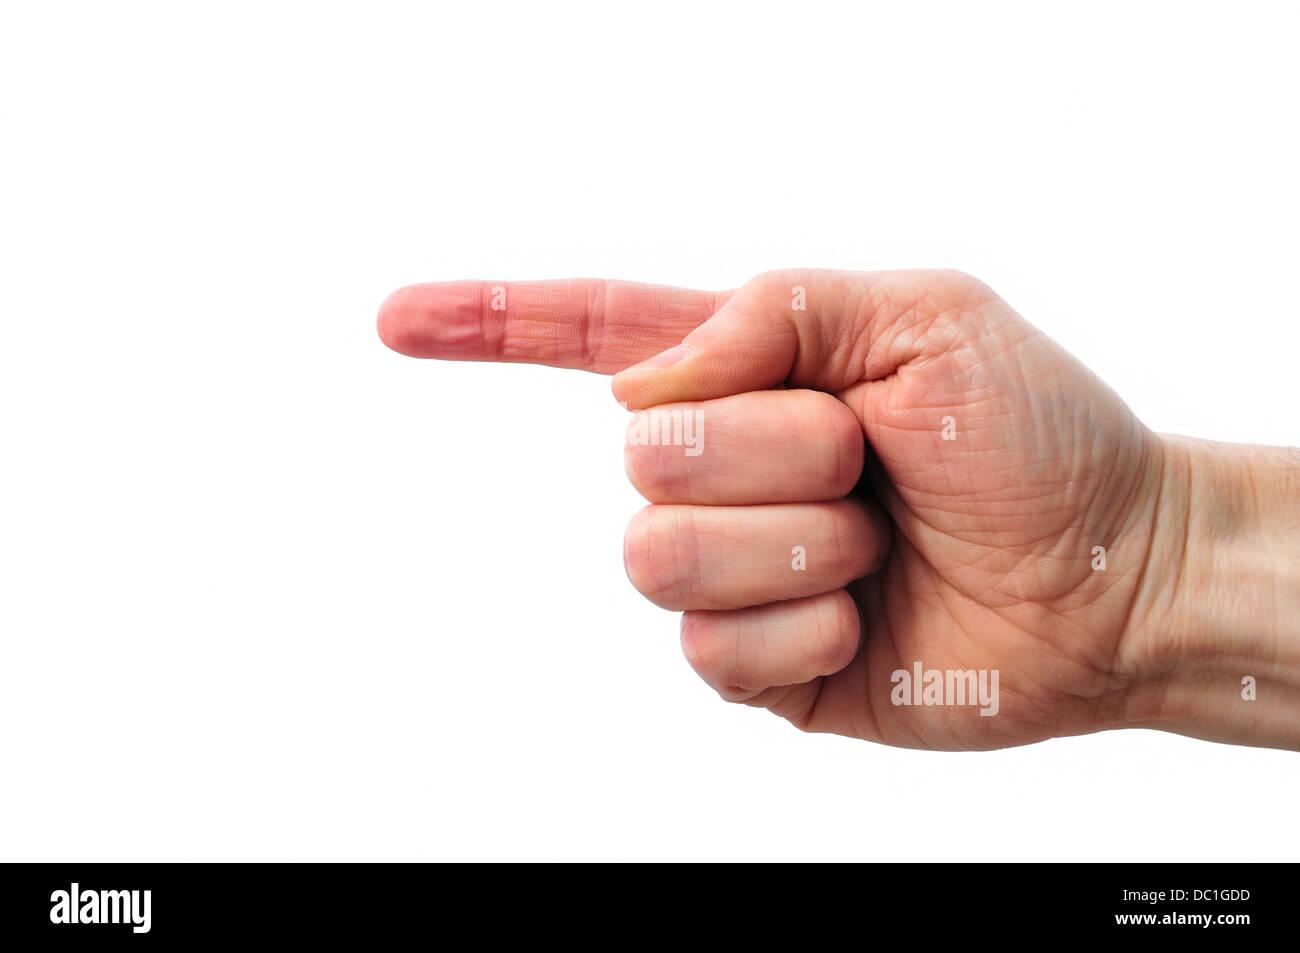 Finger pointing left - Stock Image